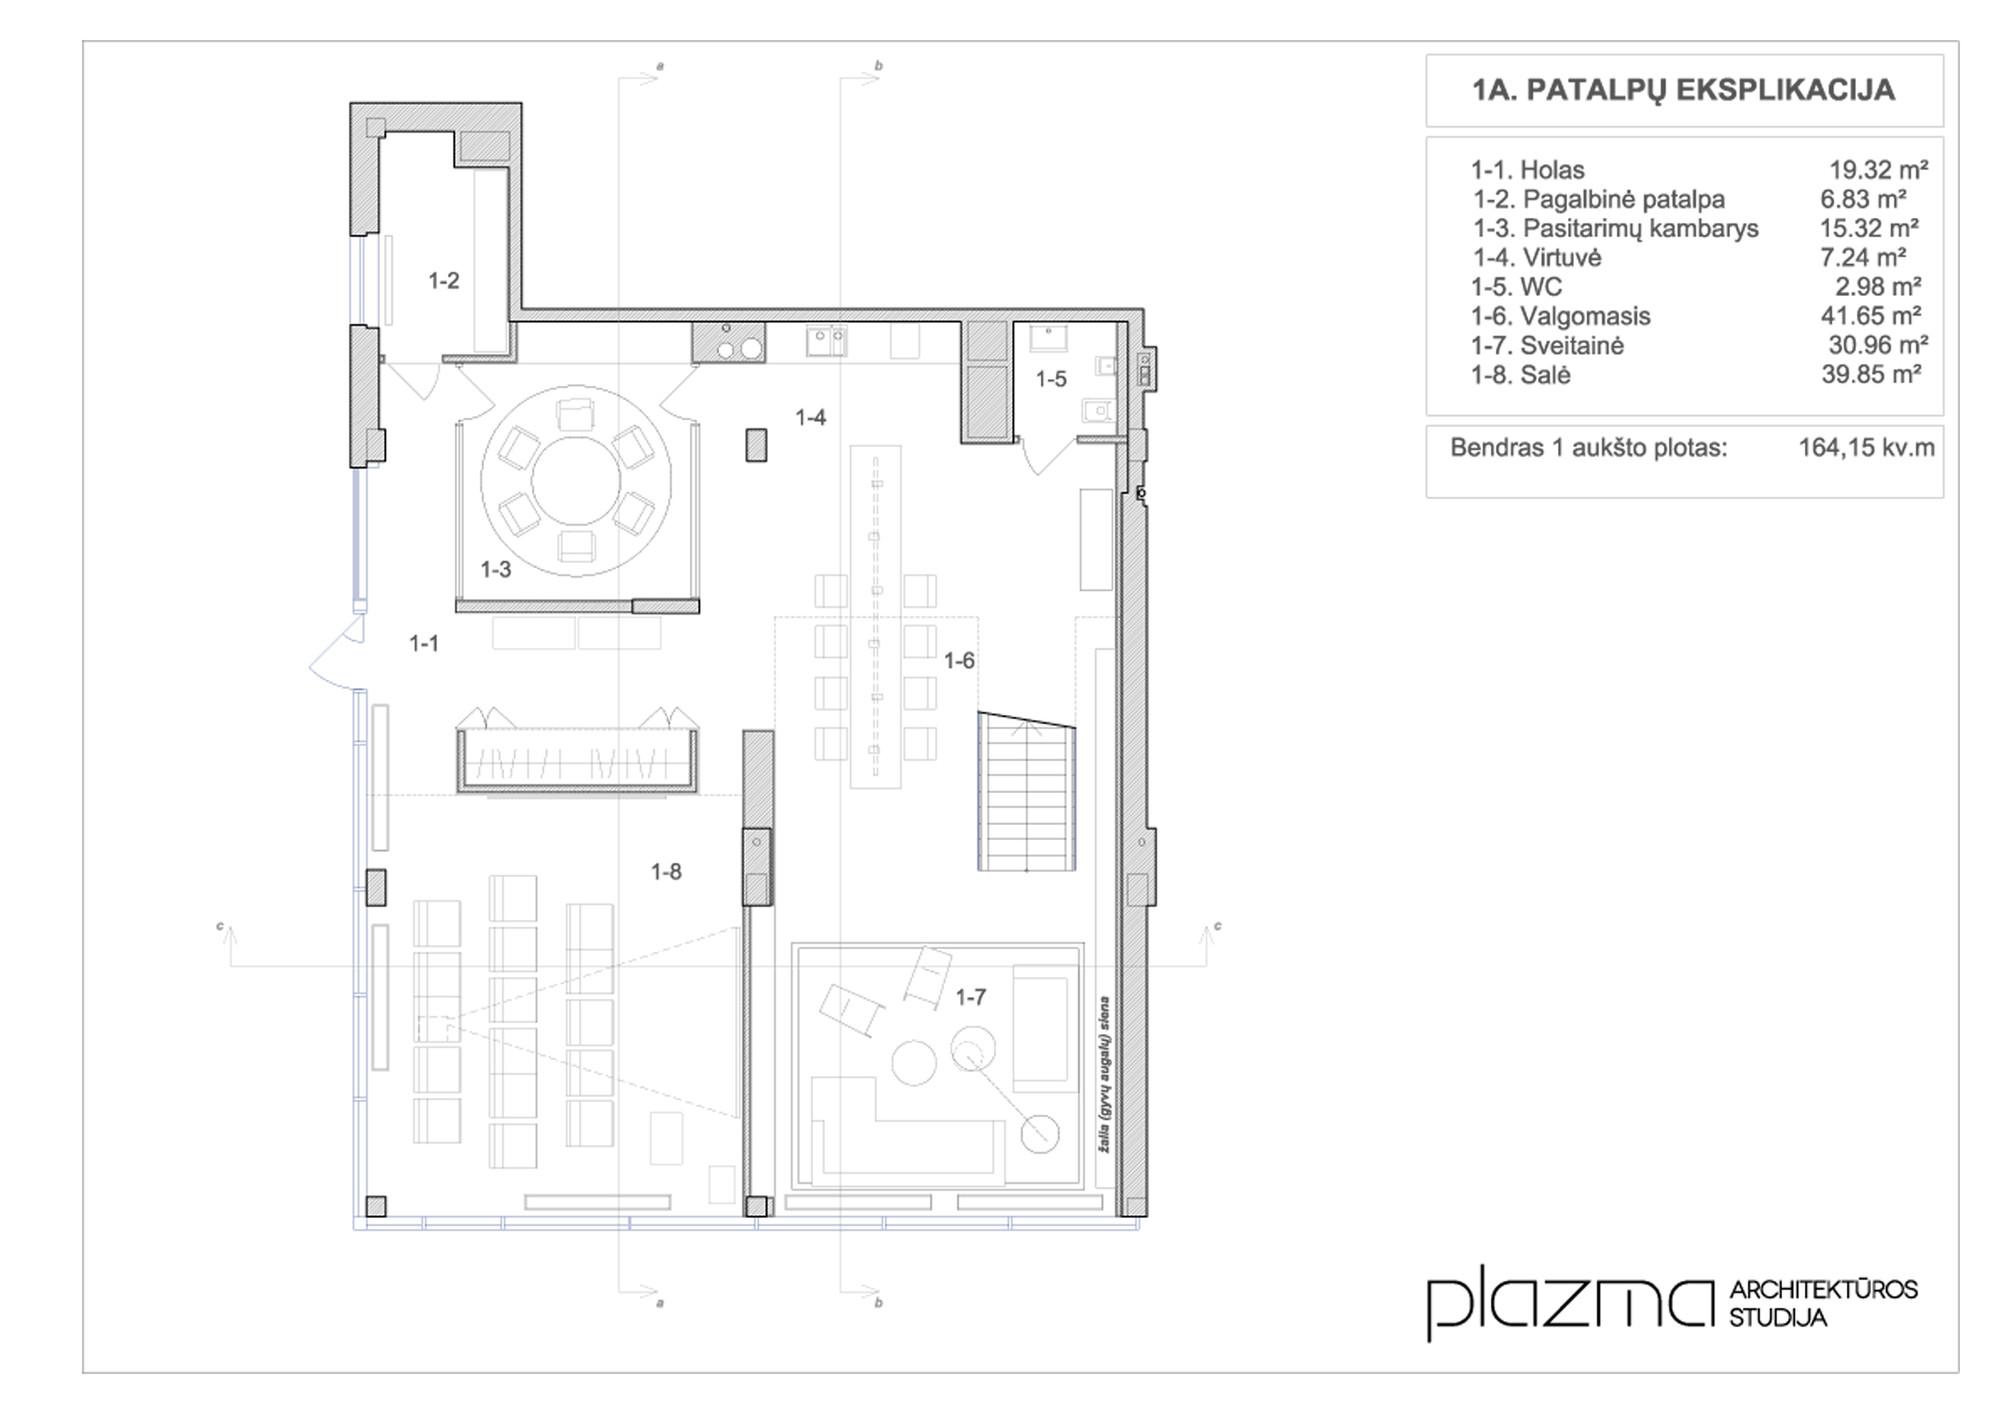 Gallery Of Pixelmator Team Office Plazma Architecture Studio 20